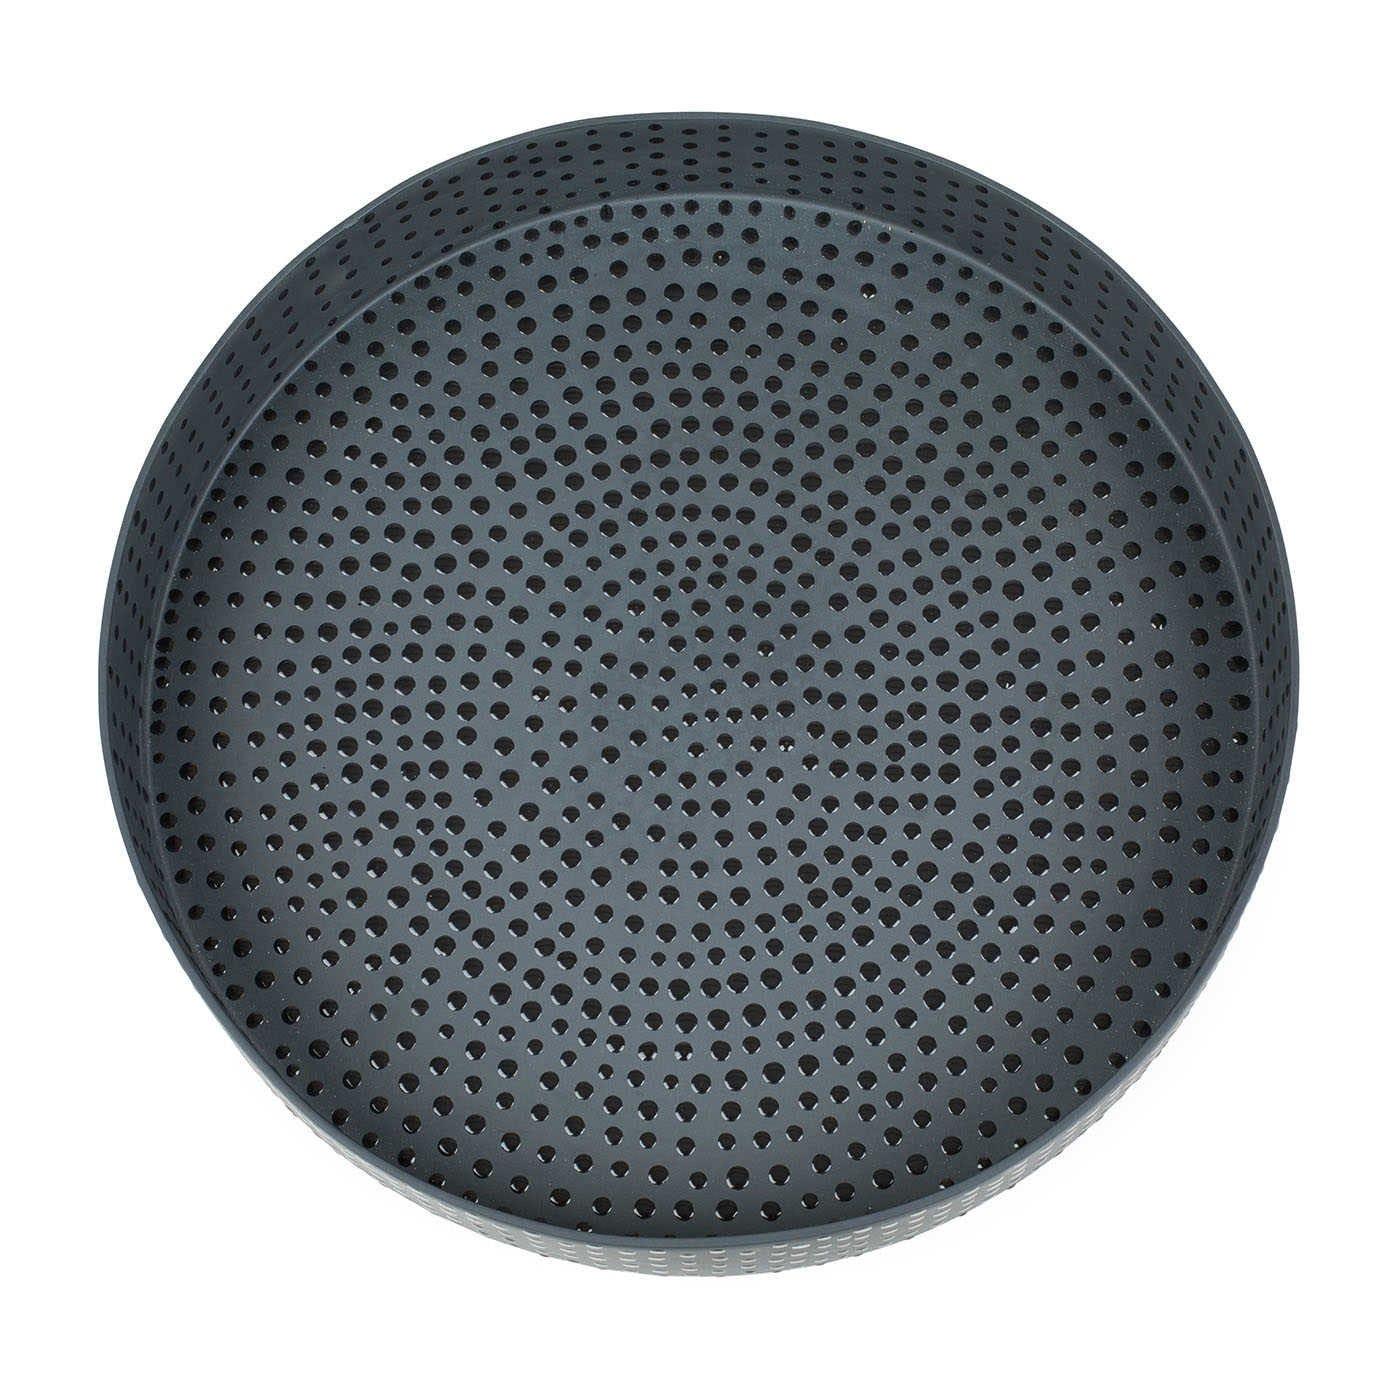 Spots Fruit Bowl Black Extra Large